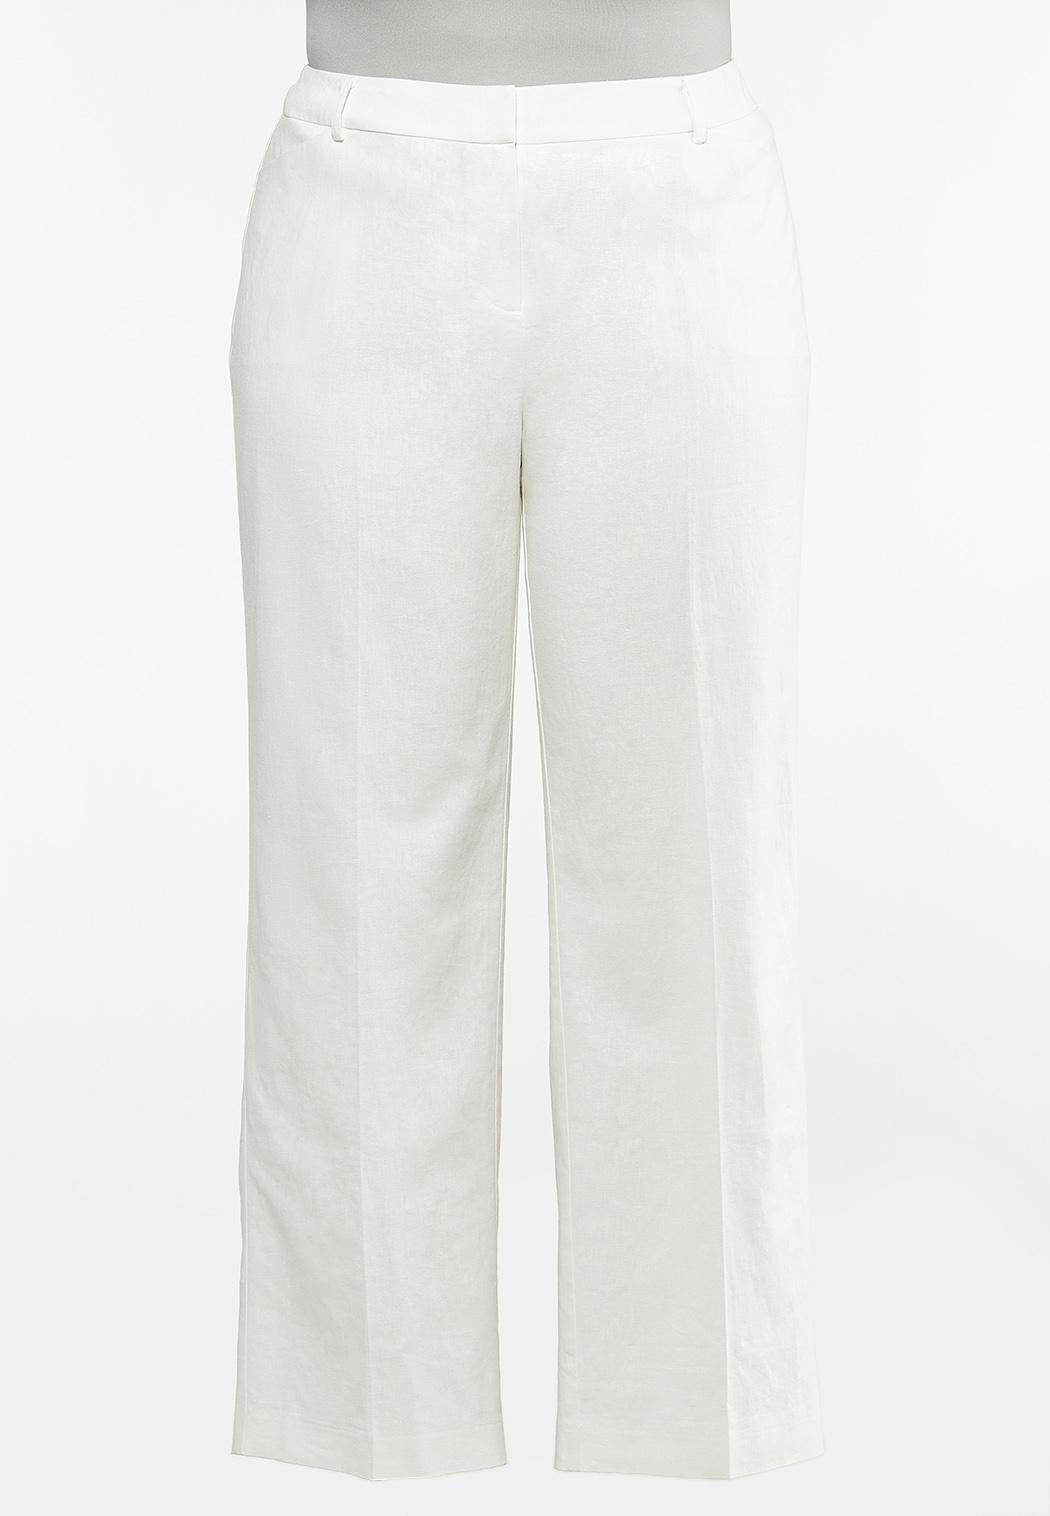 Plus Petite White Linen Trouser Pants